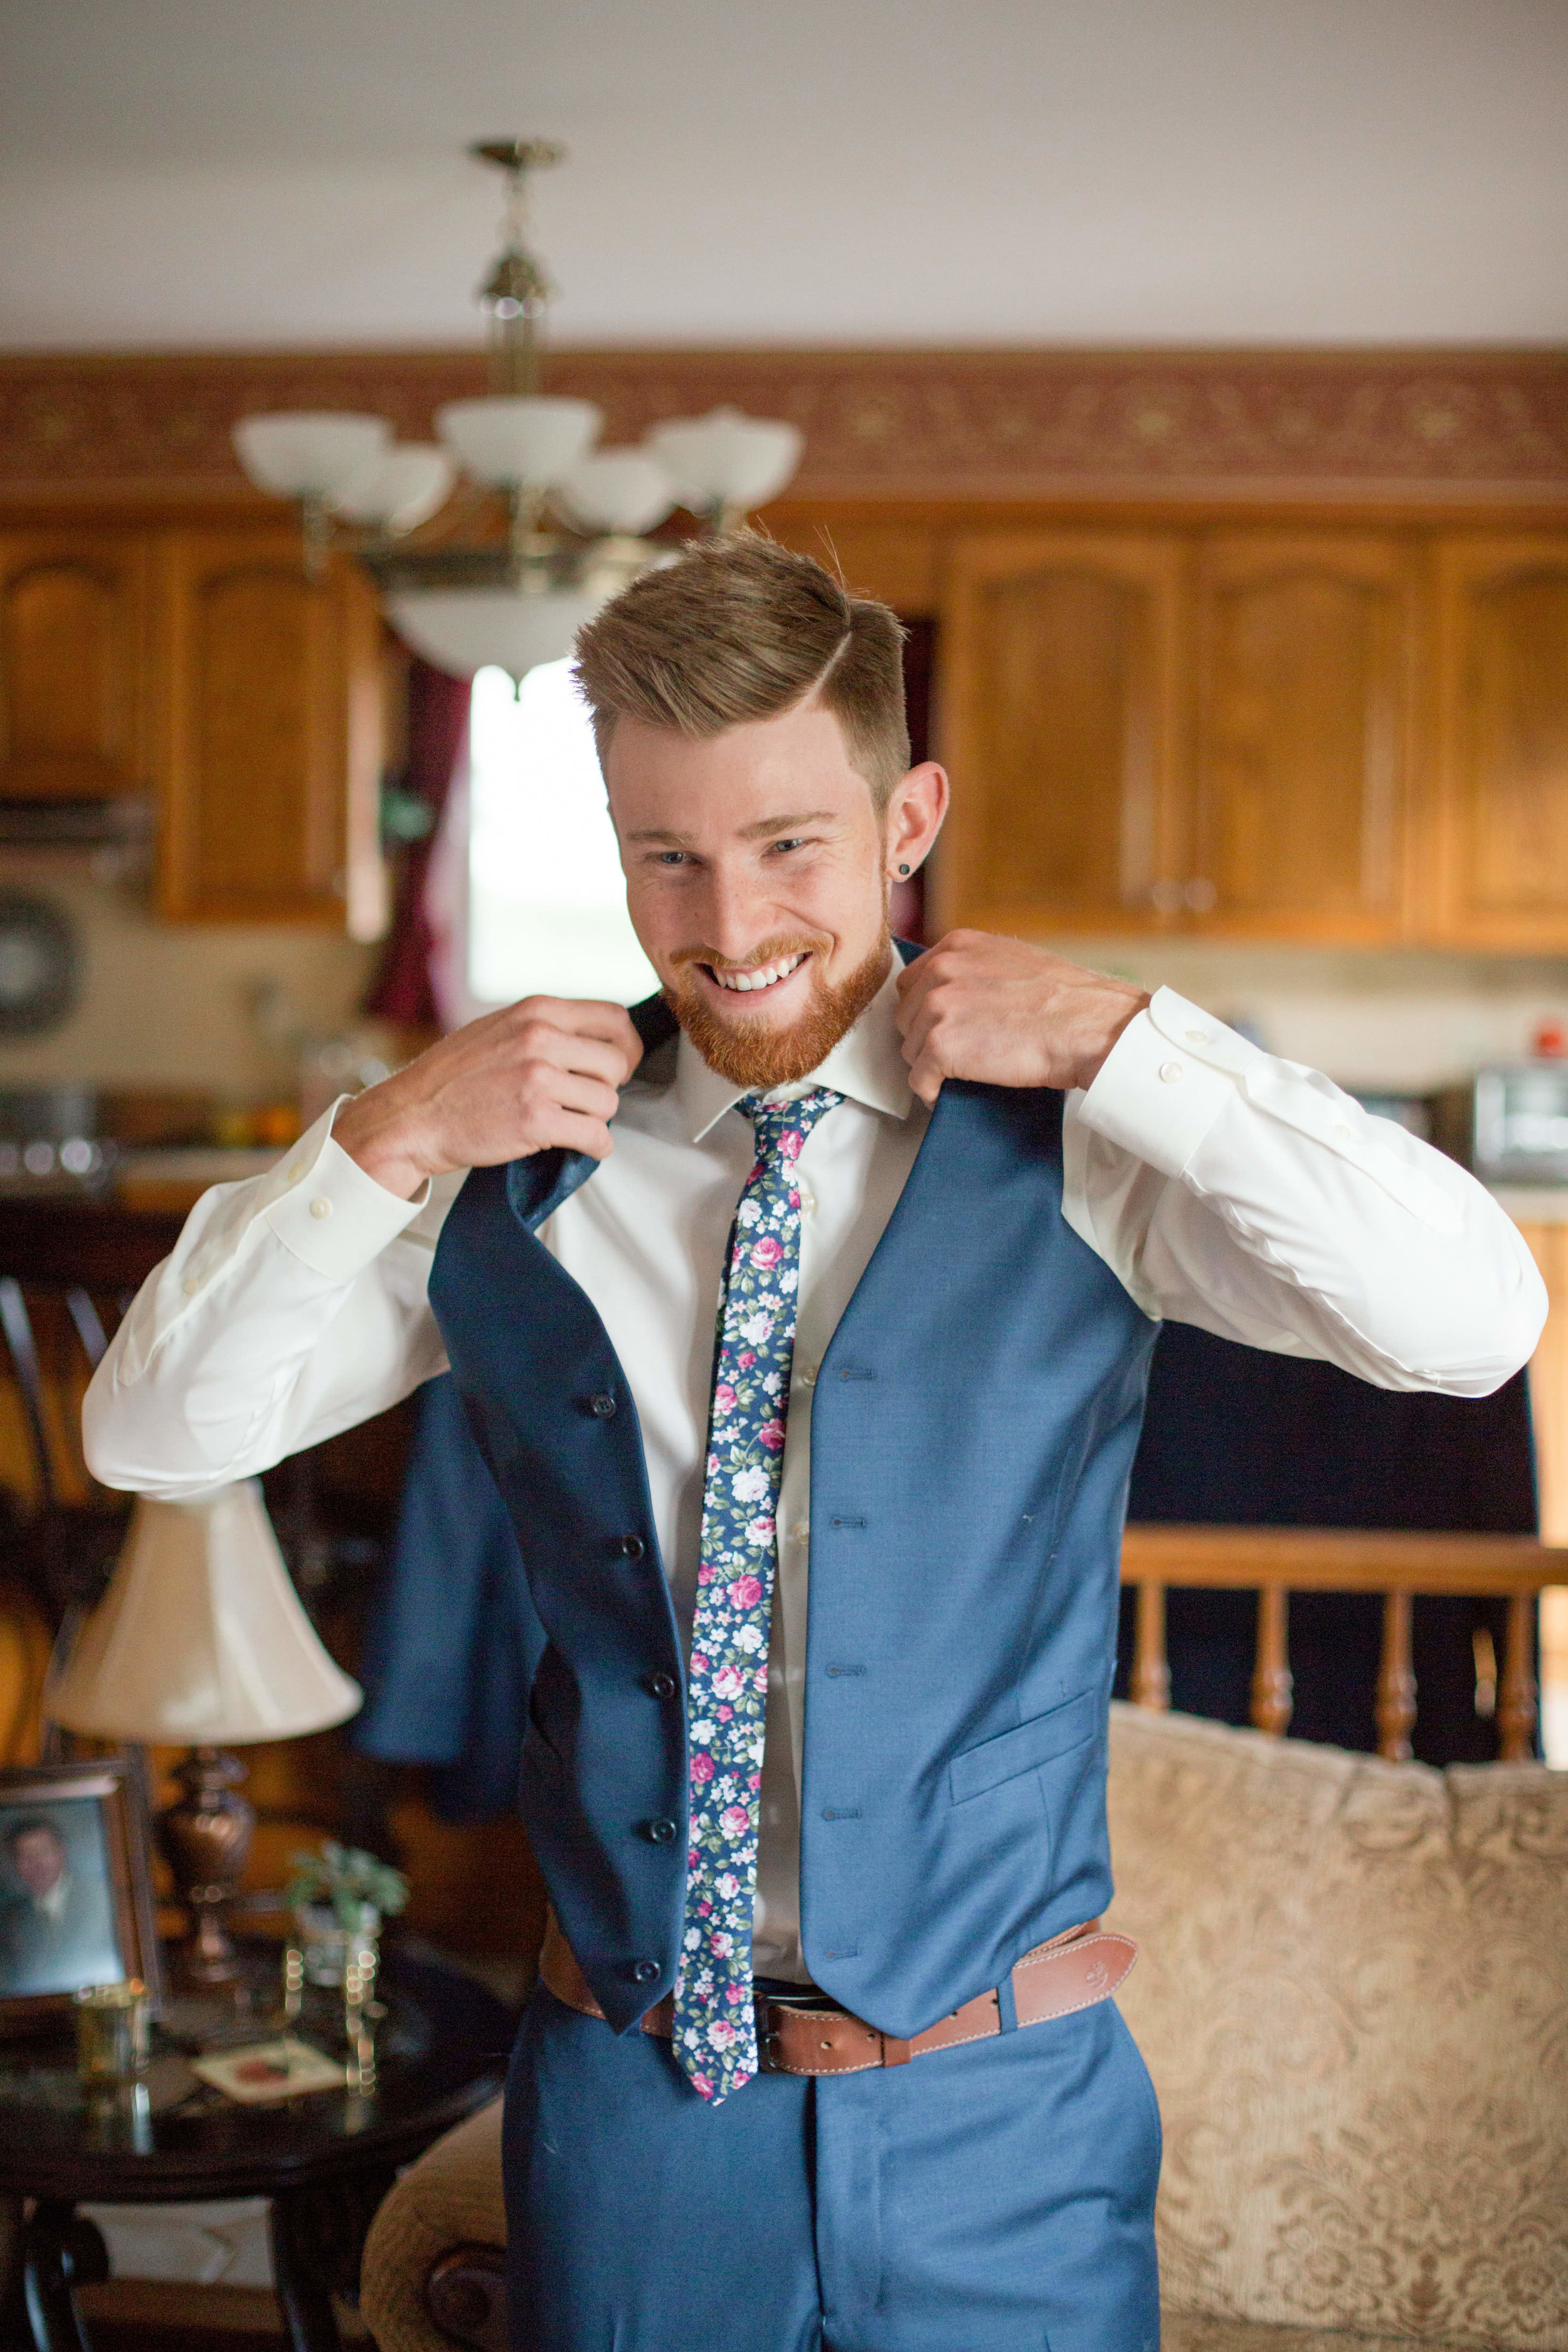 Maddy___Brandon___Daniel_Ricci_Weddings_High_Res._Finals_49.jpg